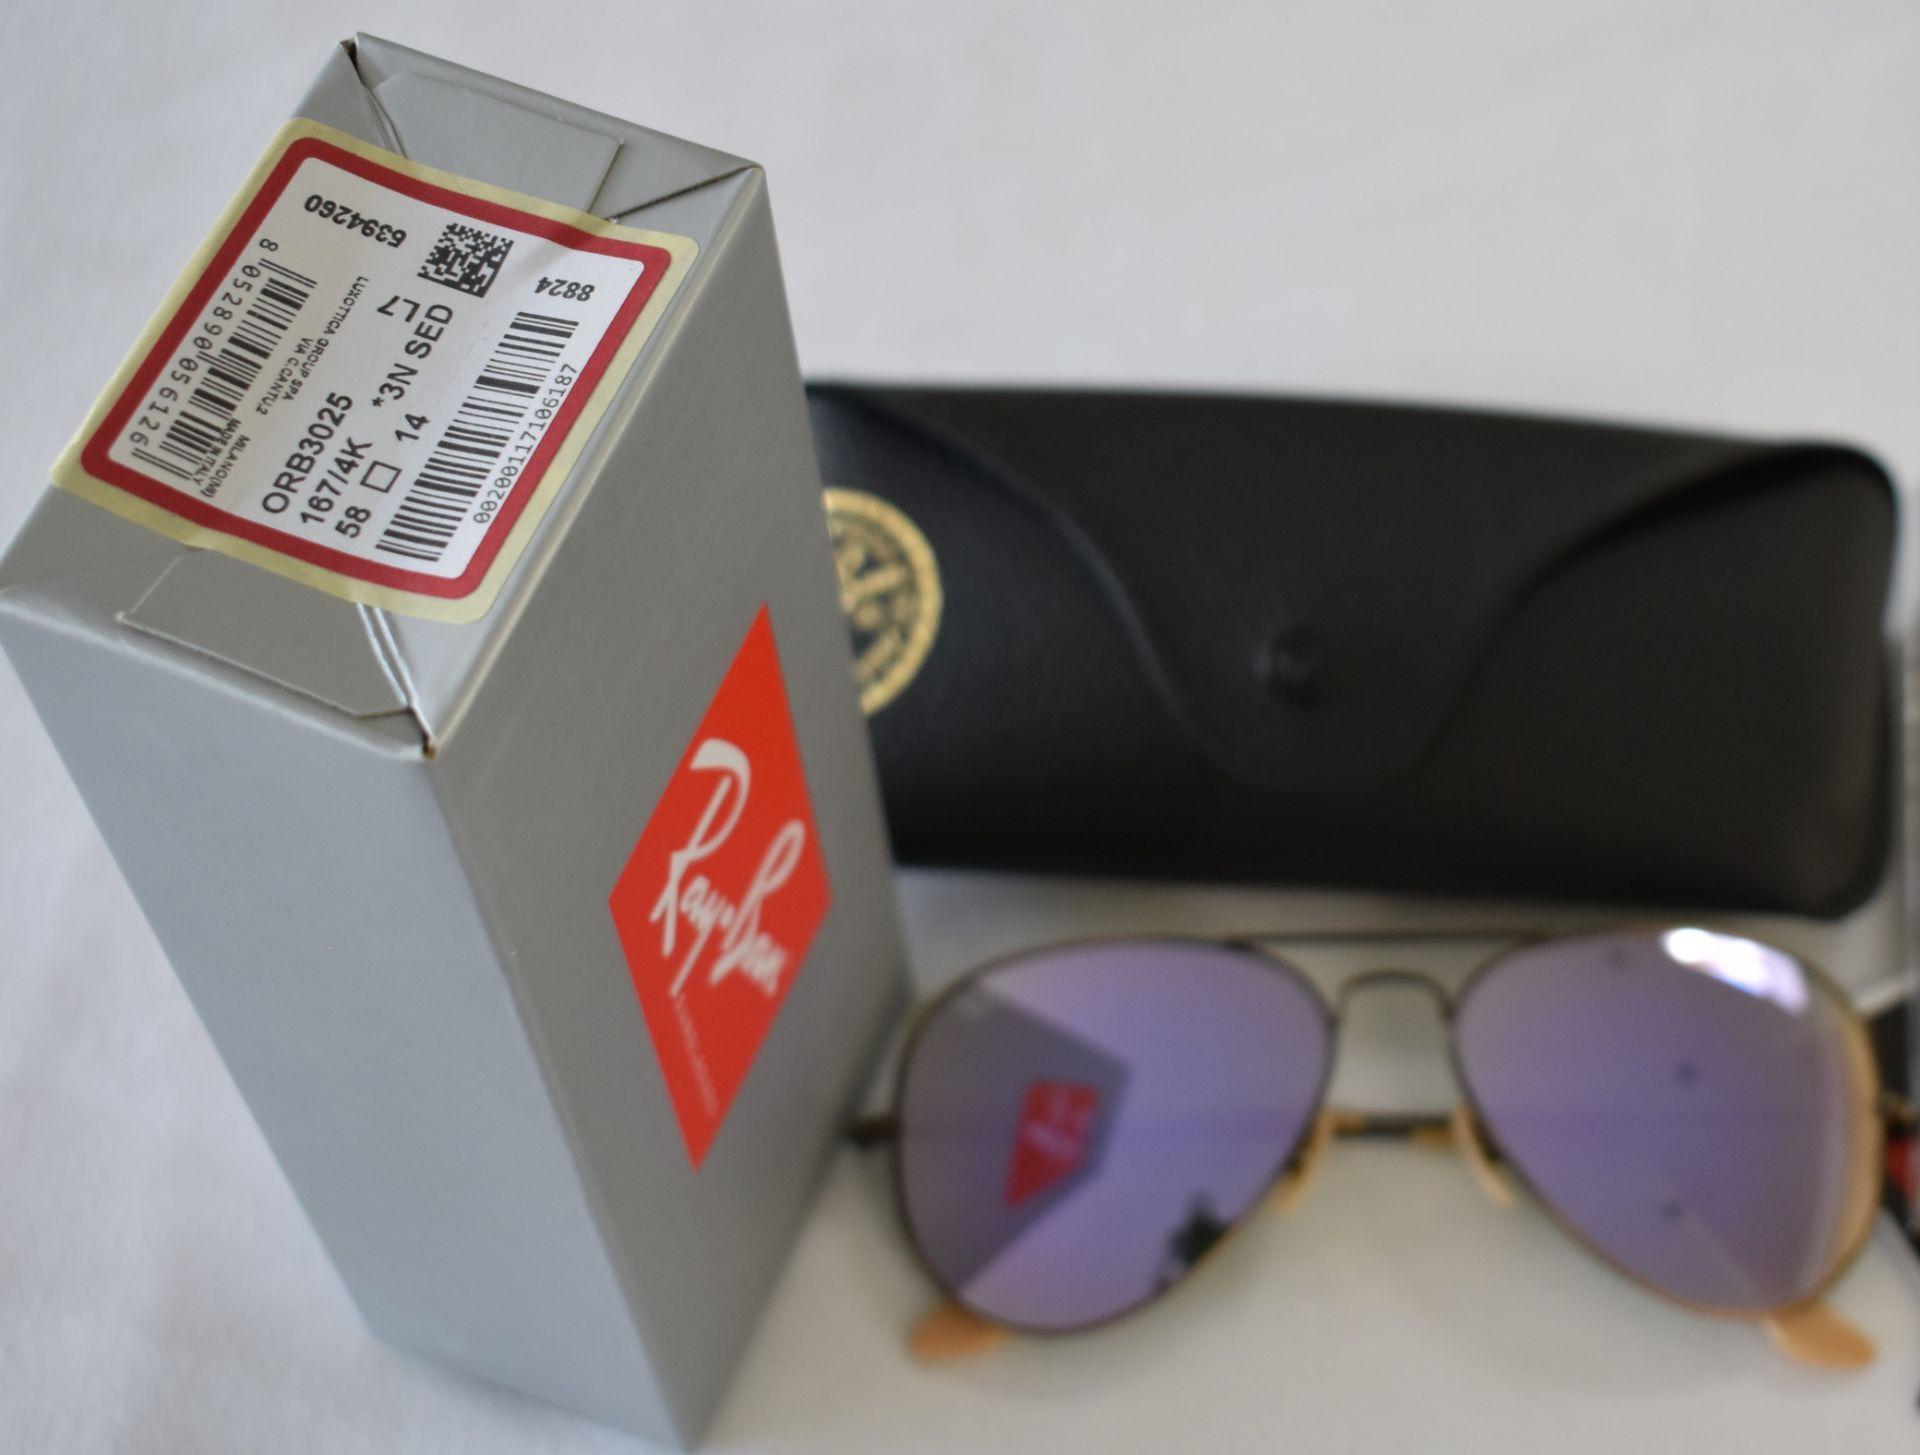 Ray Ban Sunglasses ORB3025 167/4K *3N - Image 2 of 2